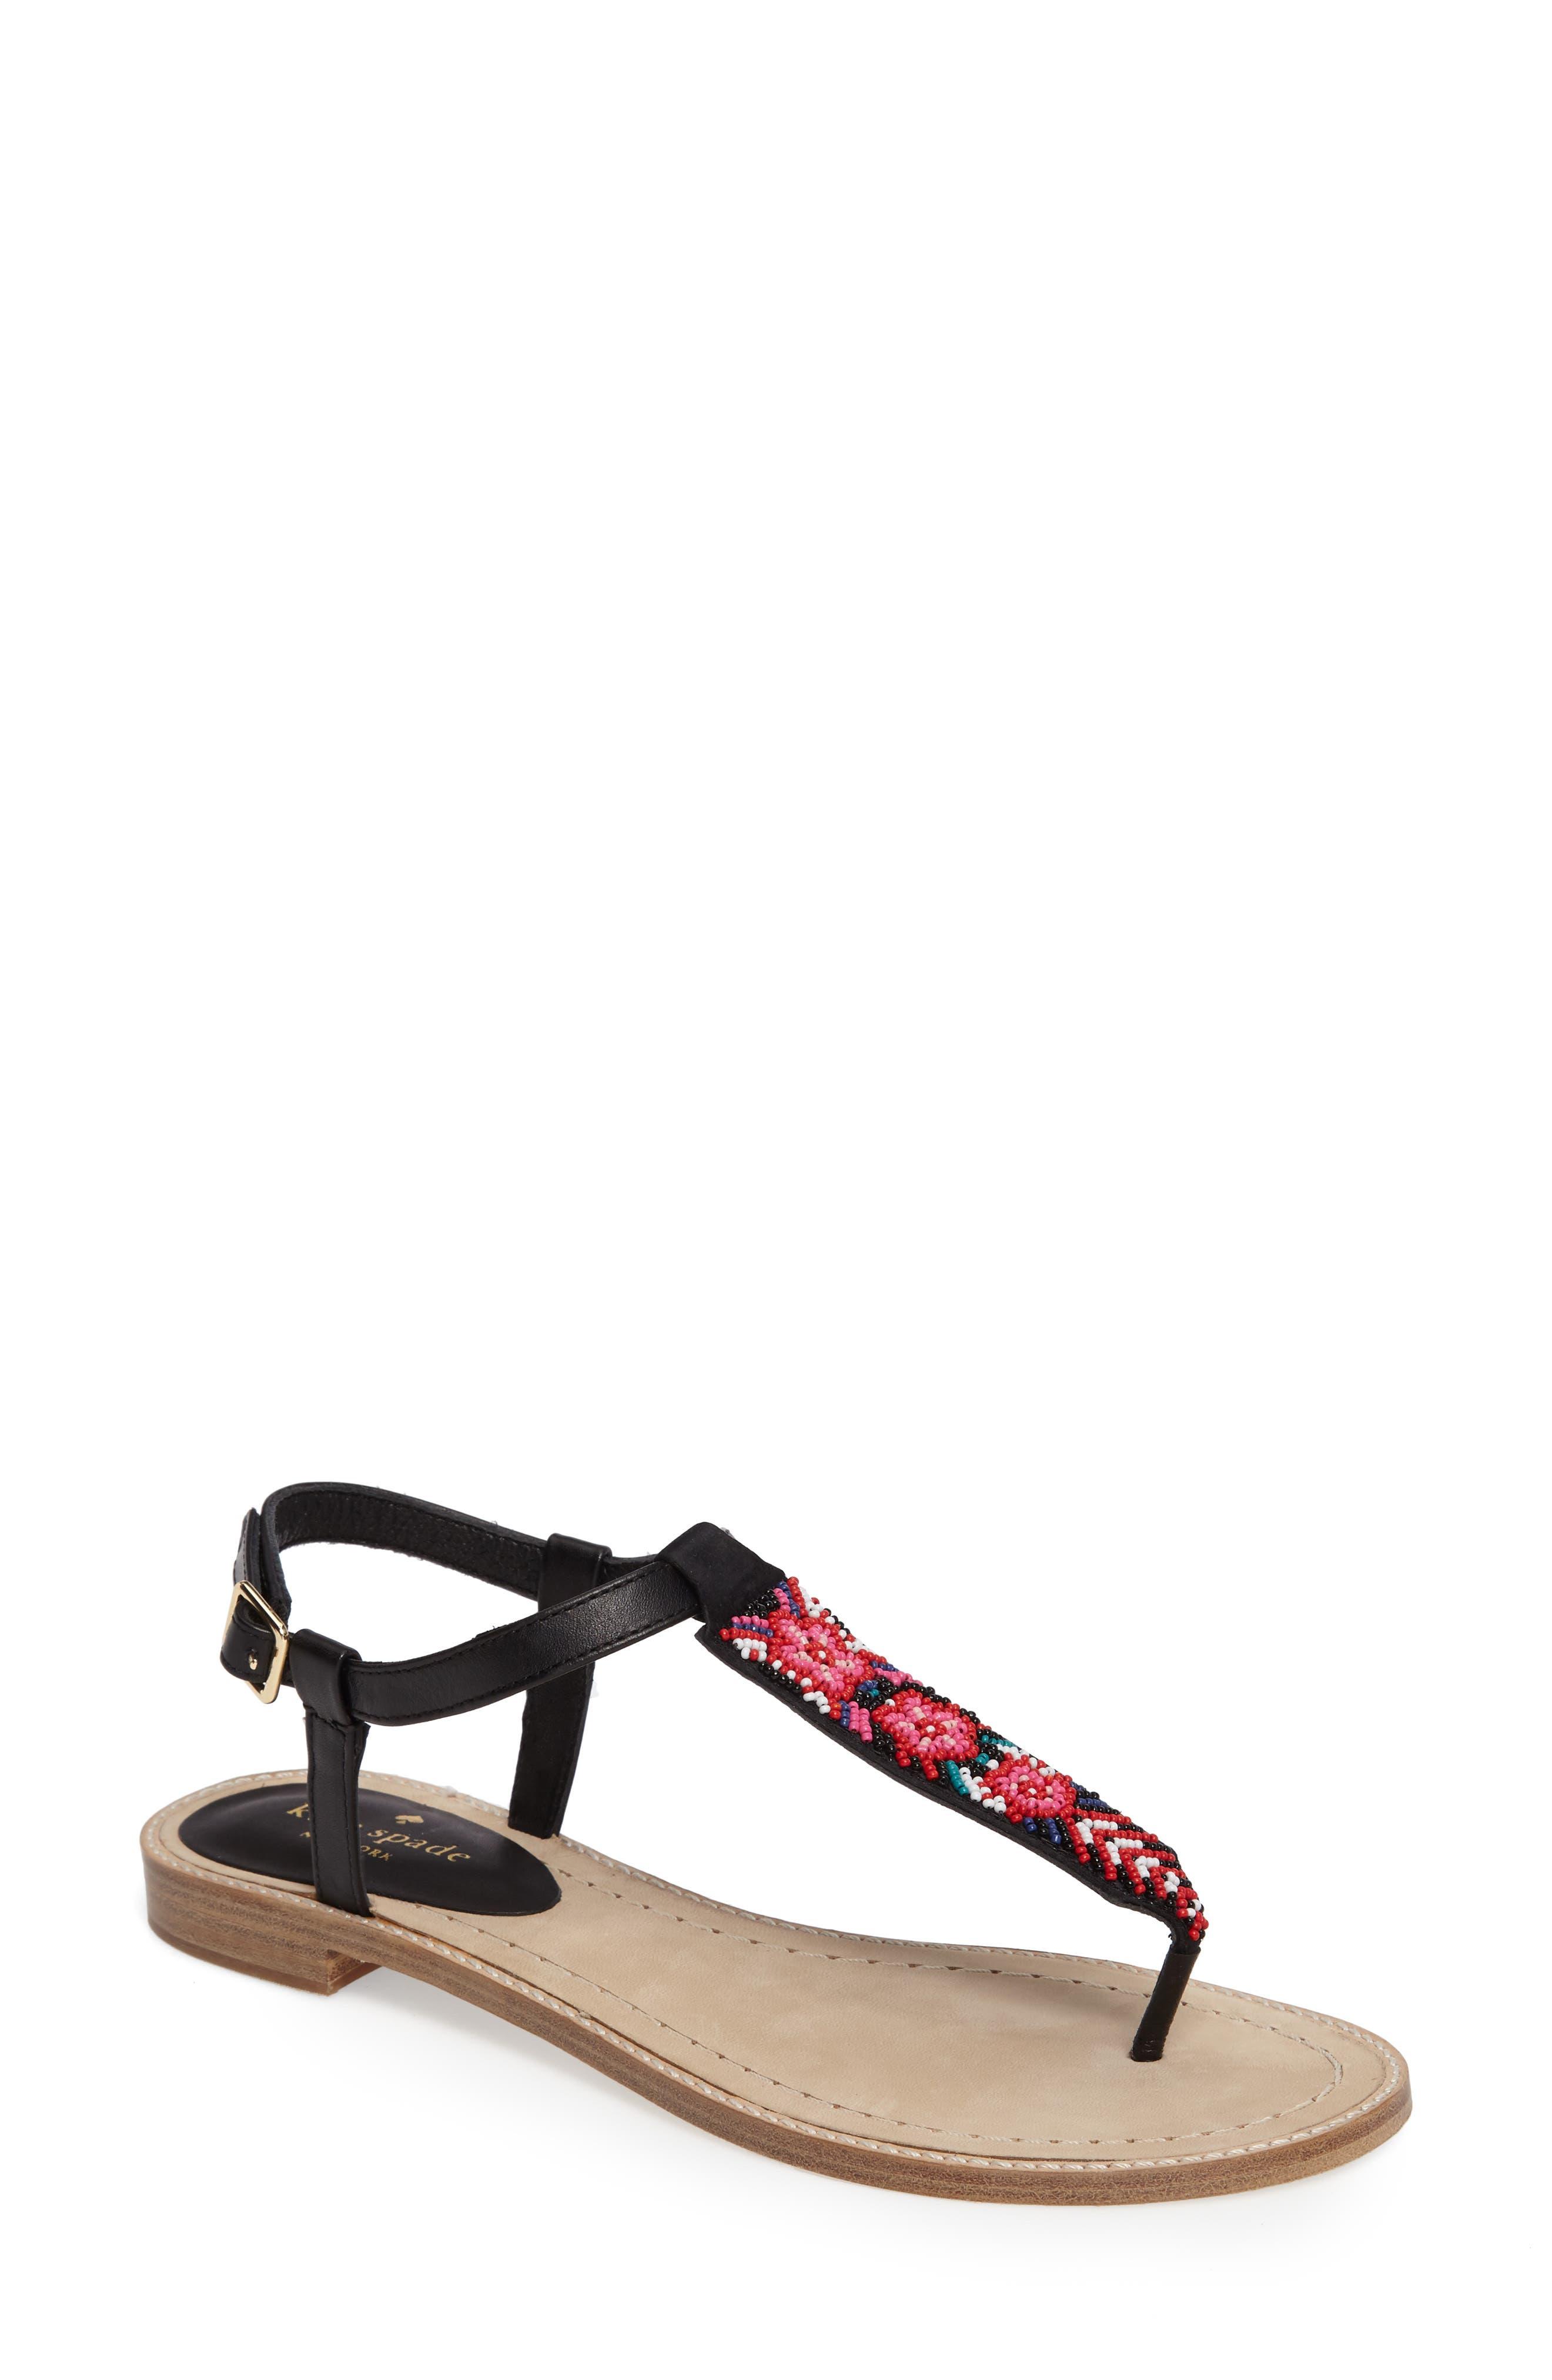 KATE SPADE NEW YORK saborsa sandal